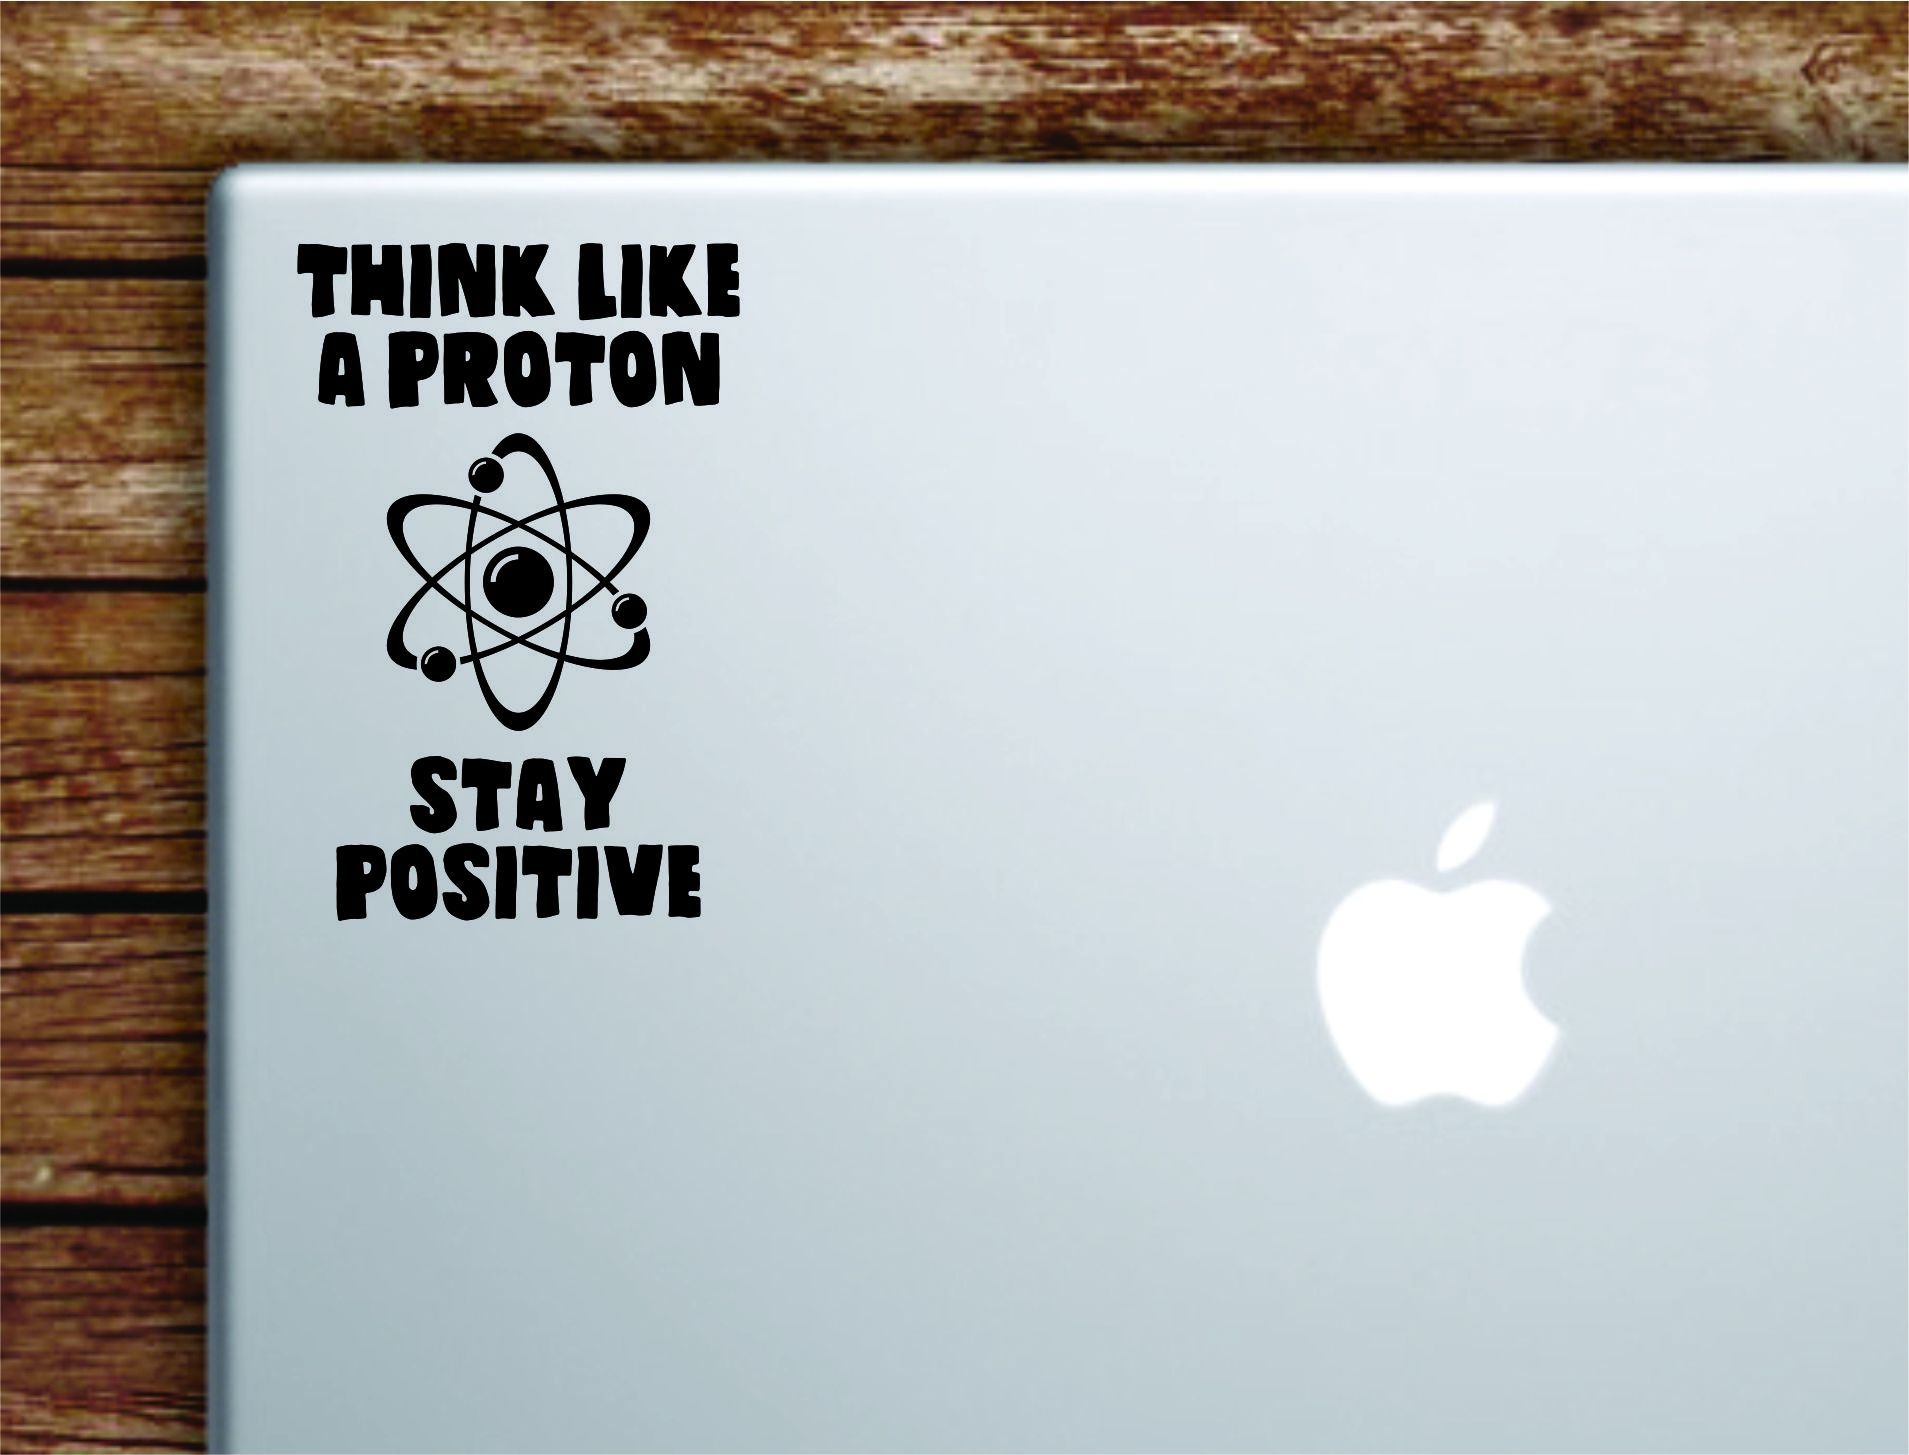 Think Like A Proton V2 Laptop Wall Decal Sticker Vinyl Art Quote Macbook Decor Car Window Truck Kids Baby Teen Inspirational Girls Science School Smart Teacher - teal